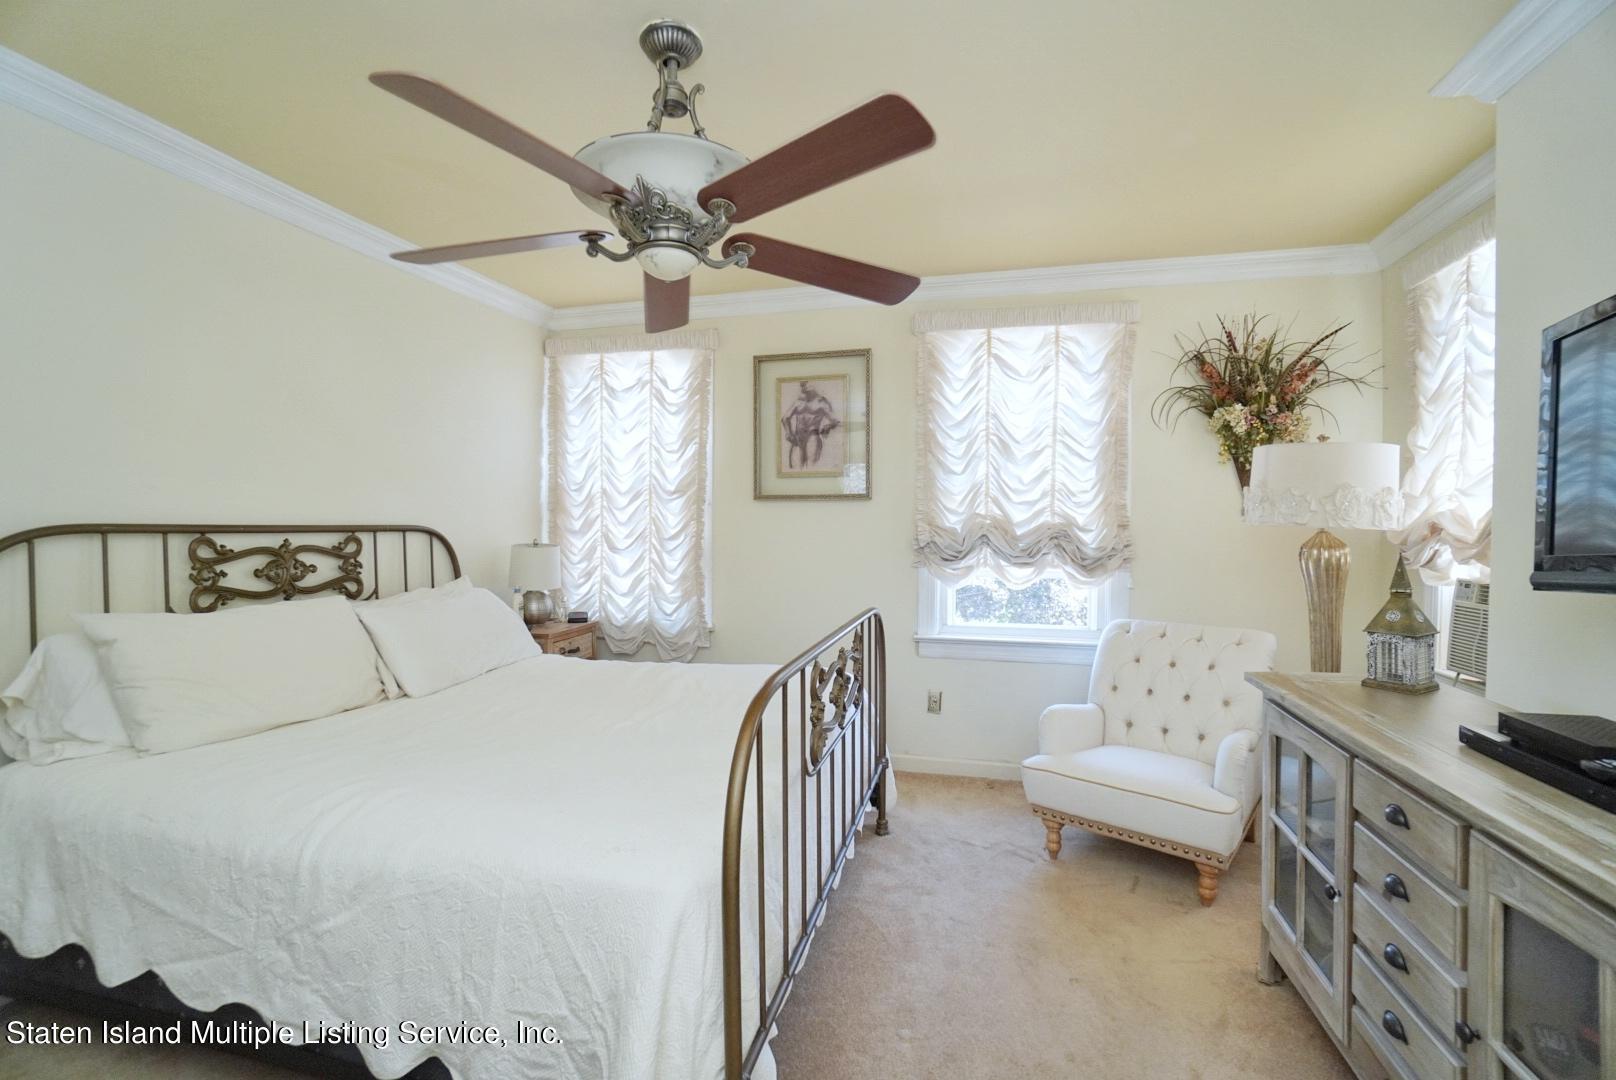 Single Family - Detached 264 Fisher Avenue  Staten Island, NY 10307, MLS-1146898-27